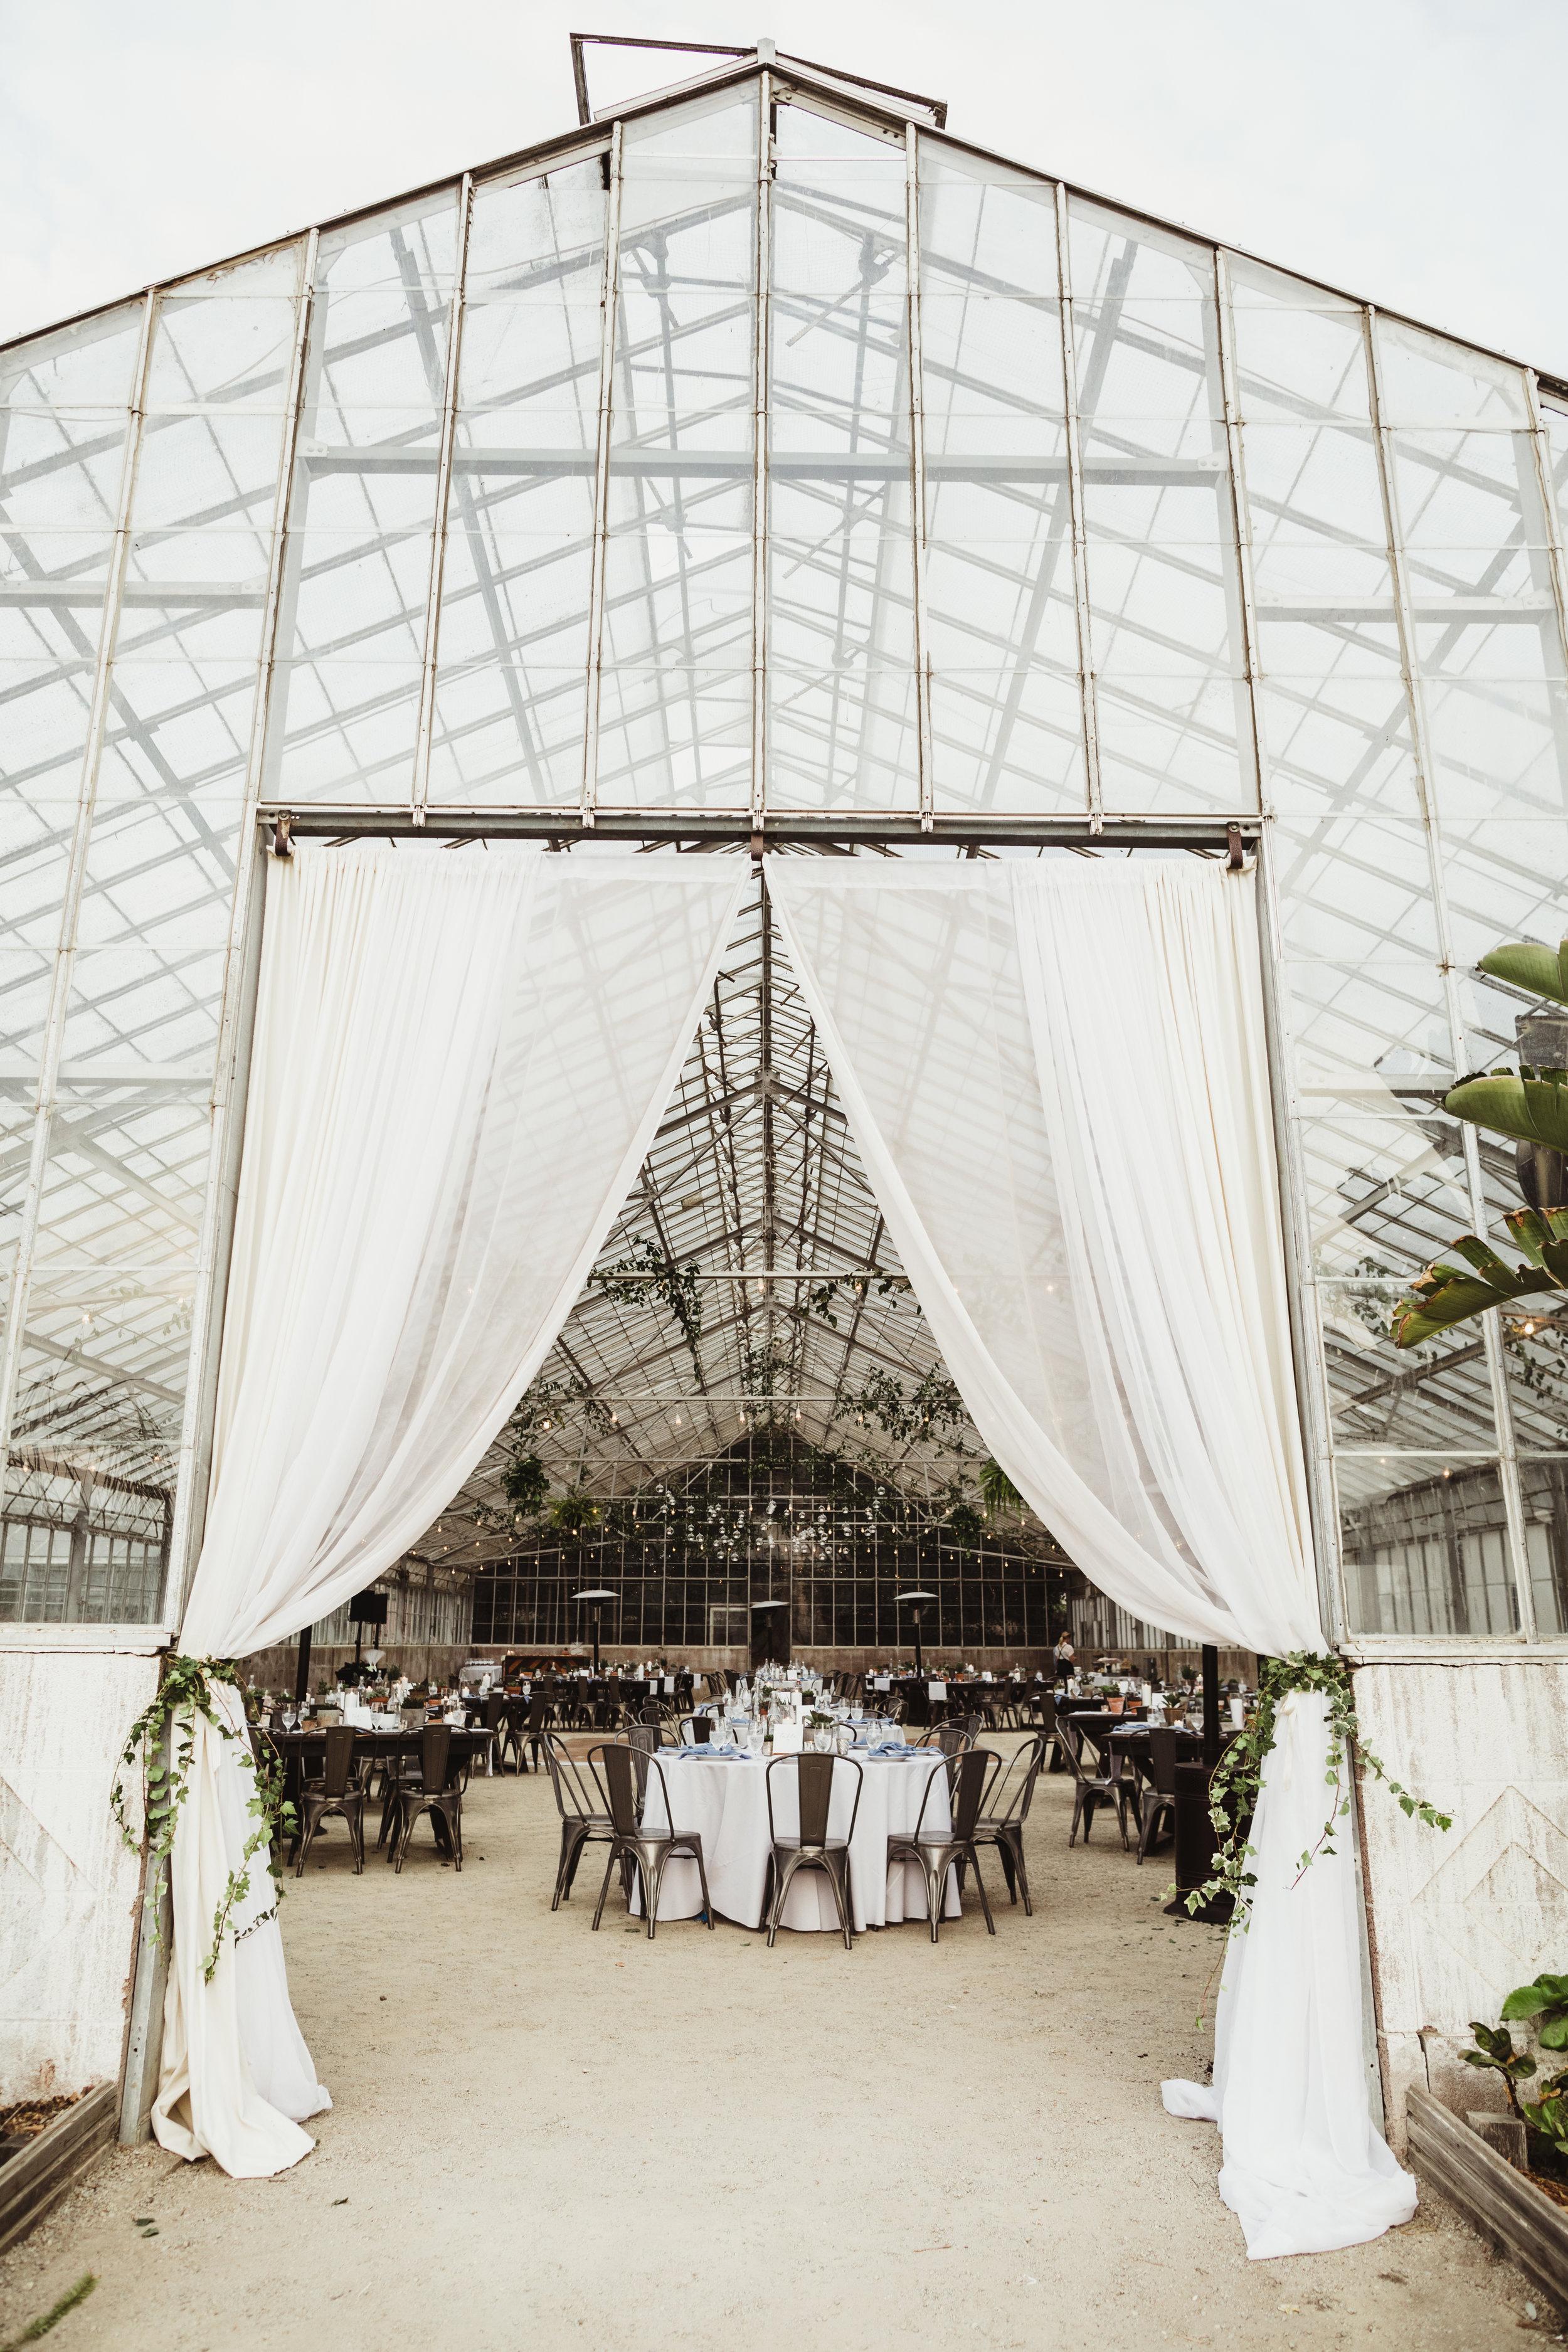 Jamie_English_Photography_JordanErik_Dos_Pueblos_Orchid_Wedding_Santa_Barbara_Fall2018-780.jpg